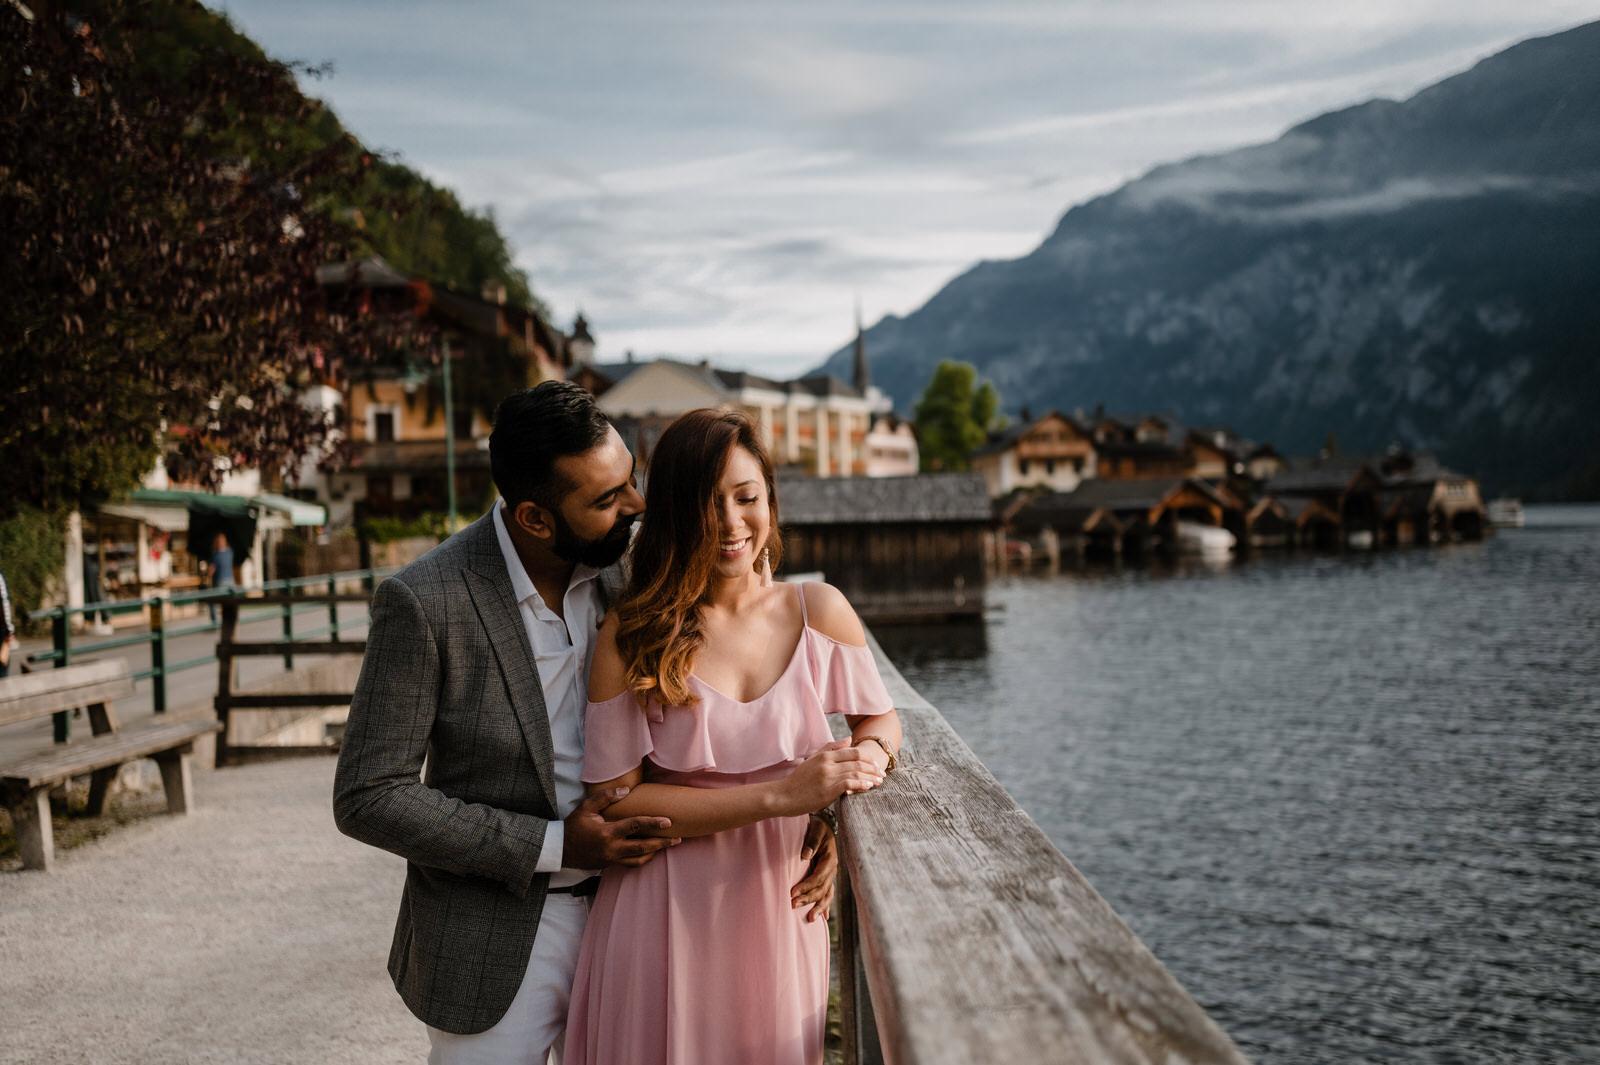 Couple Visha and Kishan standinh at the dock in Hallstatt with beautiful panorama